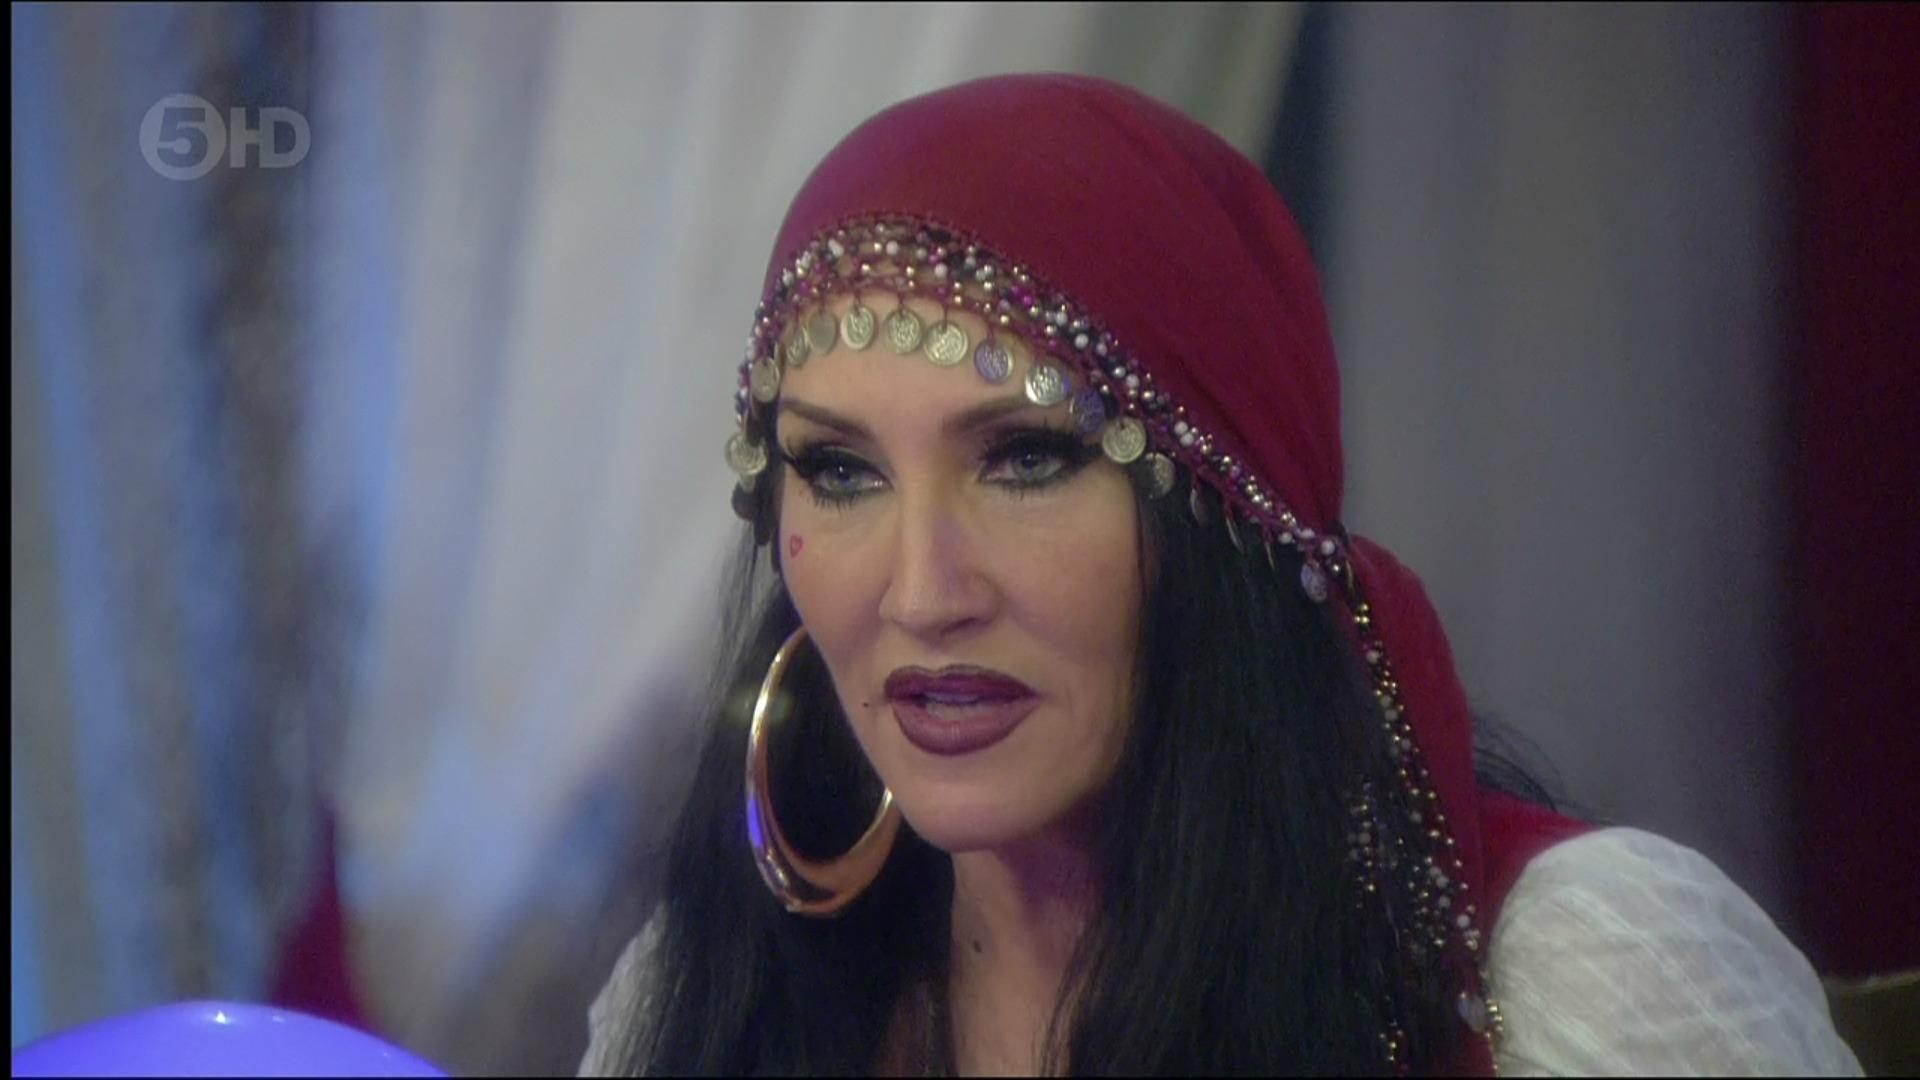 Will Michelle Visage win Celebrity Big Brother 2015?